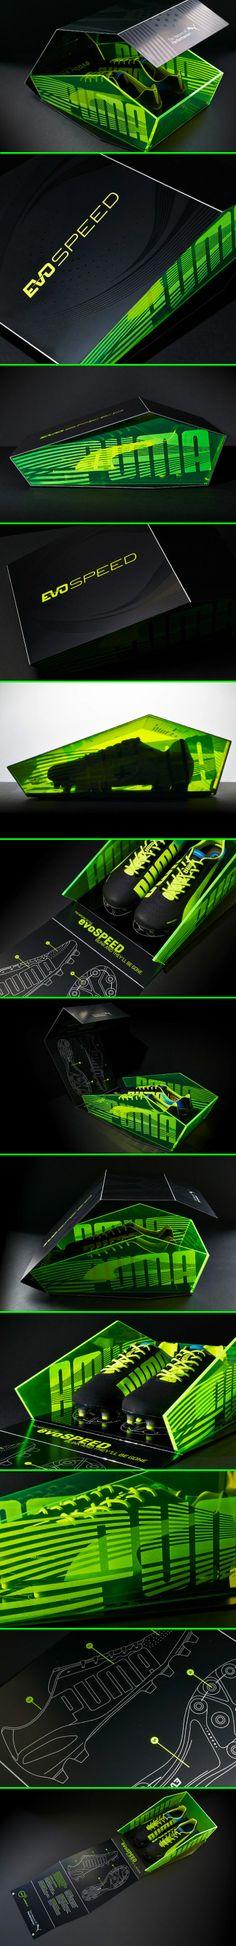 Puma EvoSpeed Limited Edition Packaging